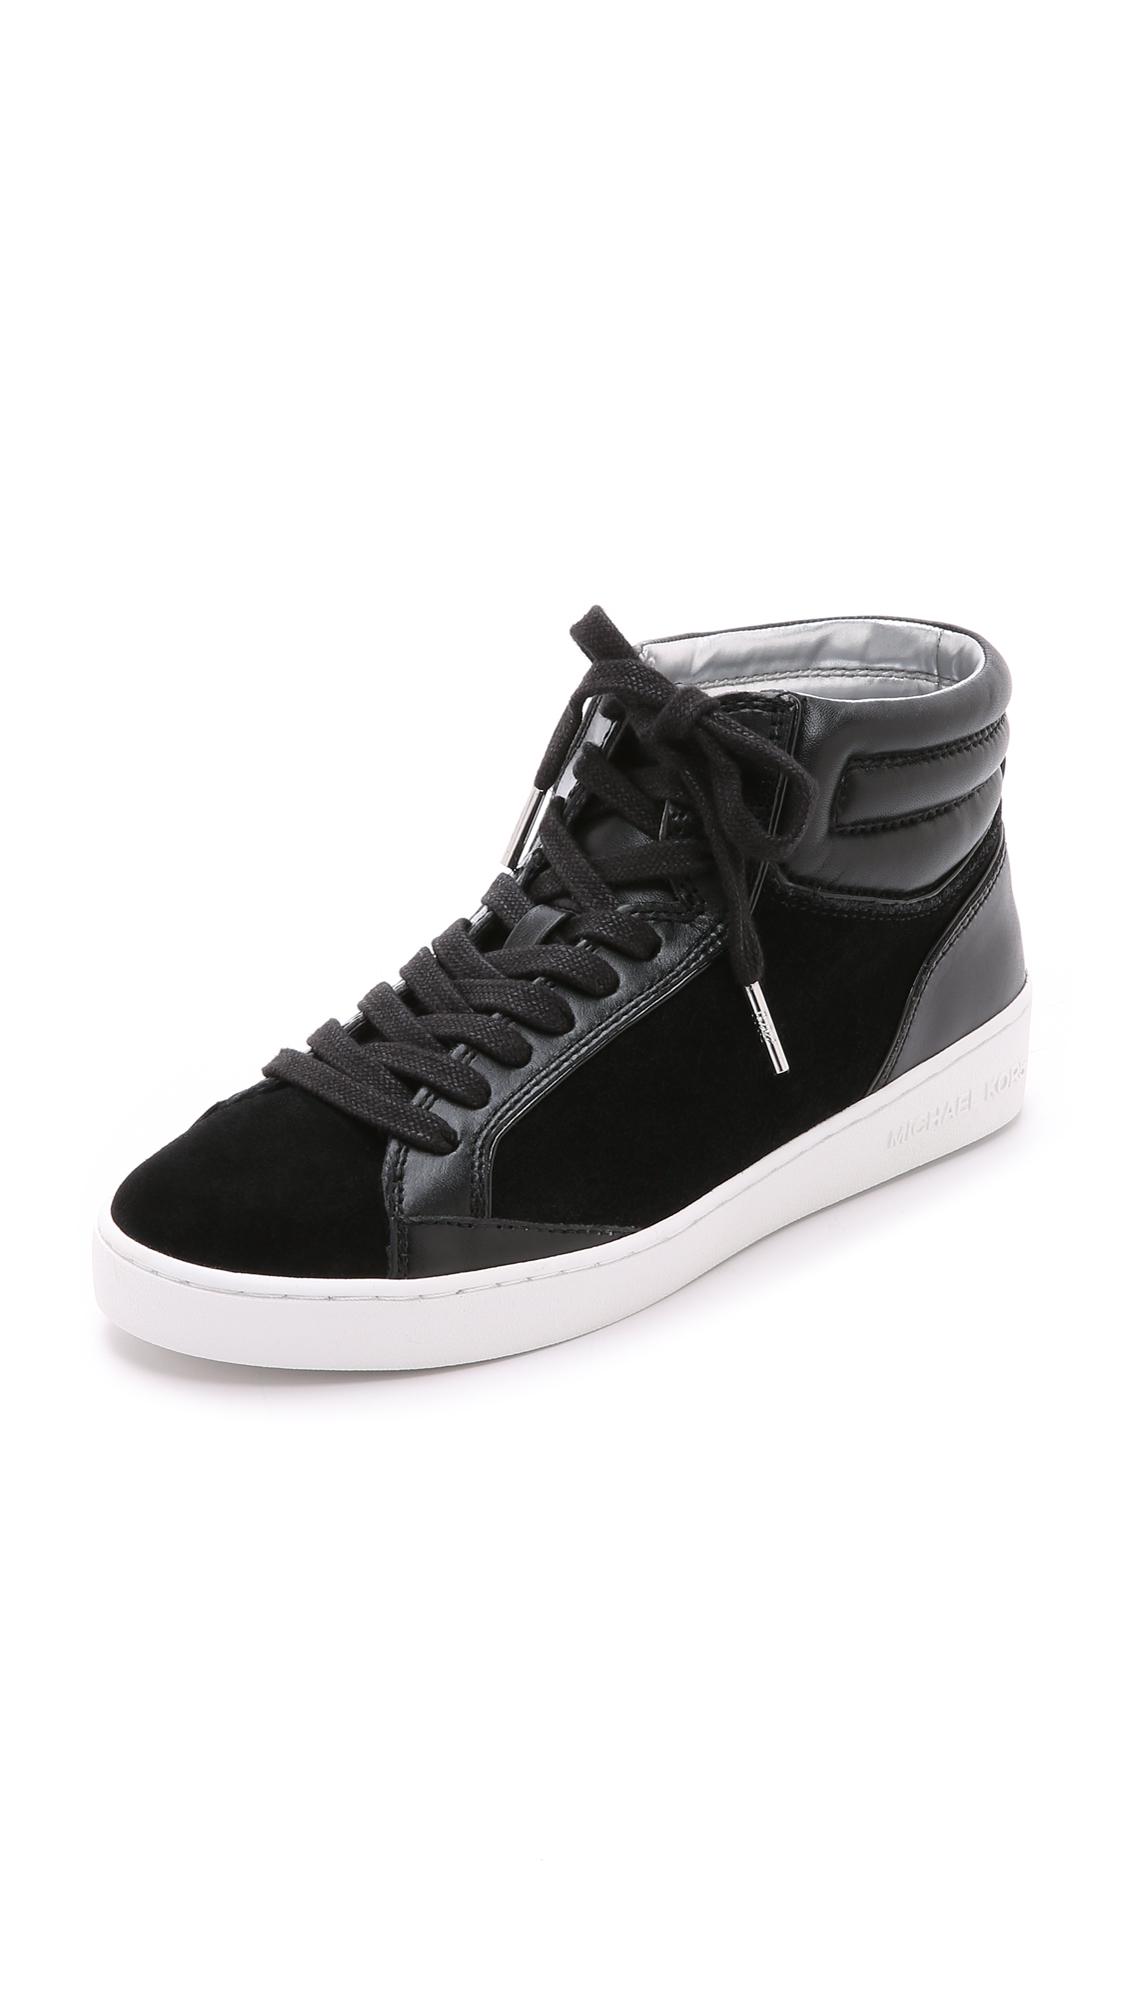 michael michael kors paige high top sneakers black in black lyst. Black Bedroom Furniture Sets. Home Design Ideas